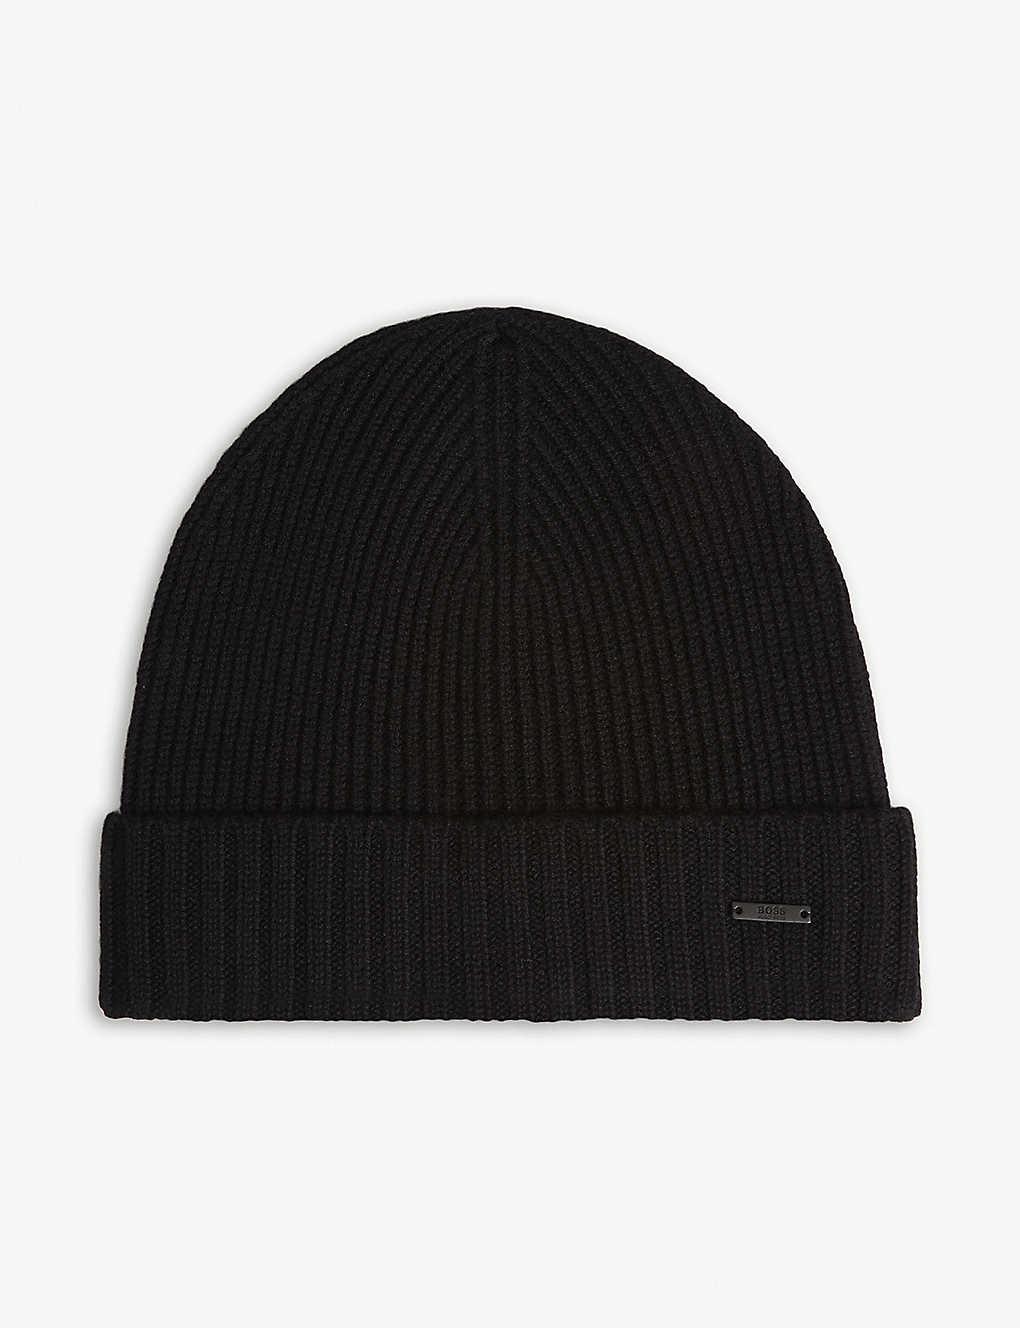 BOSS - Fati knitted wool beanie  d5075594fa7